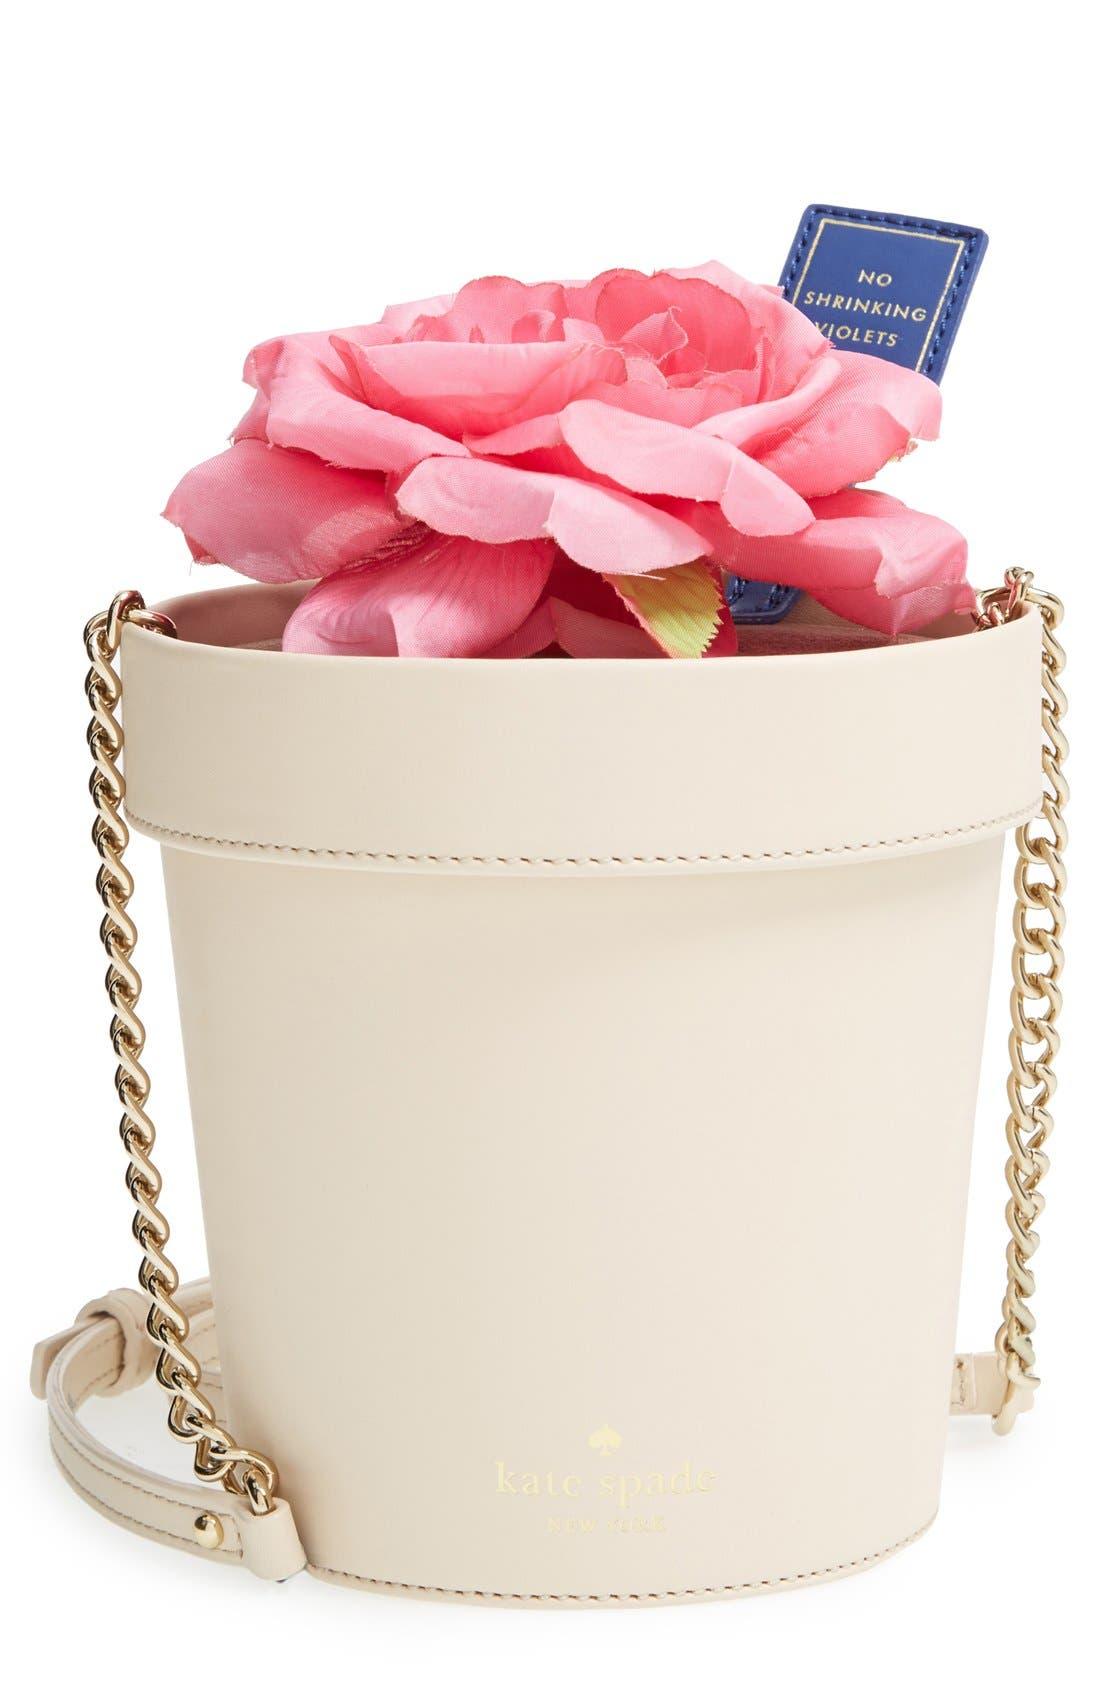 Main Image - kate spade new york 'spring forward - flowerpot' crossbody bag